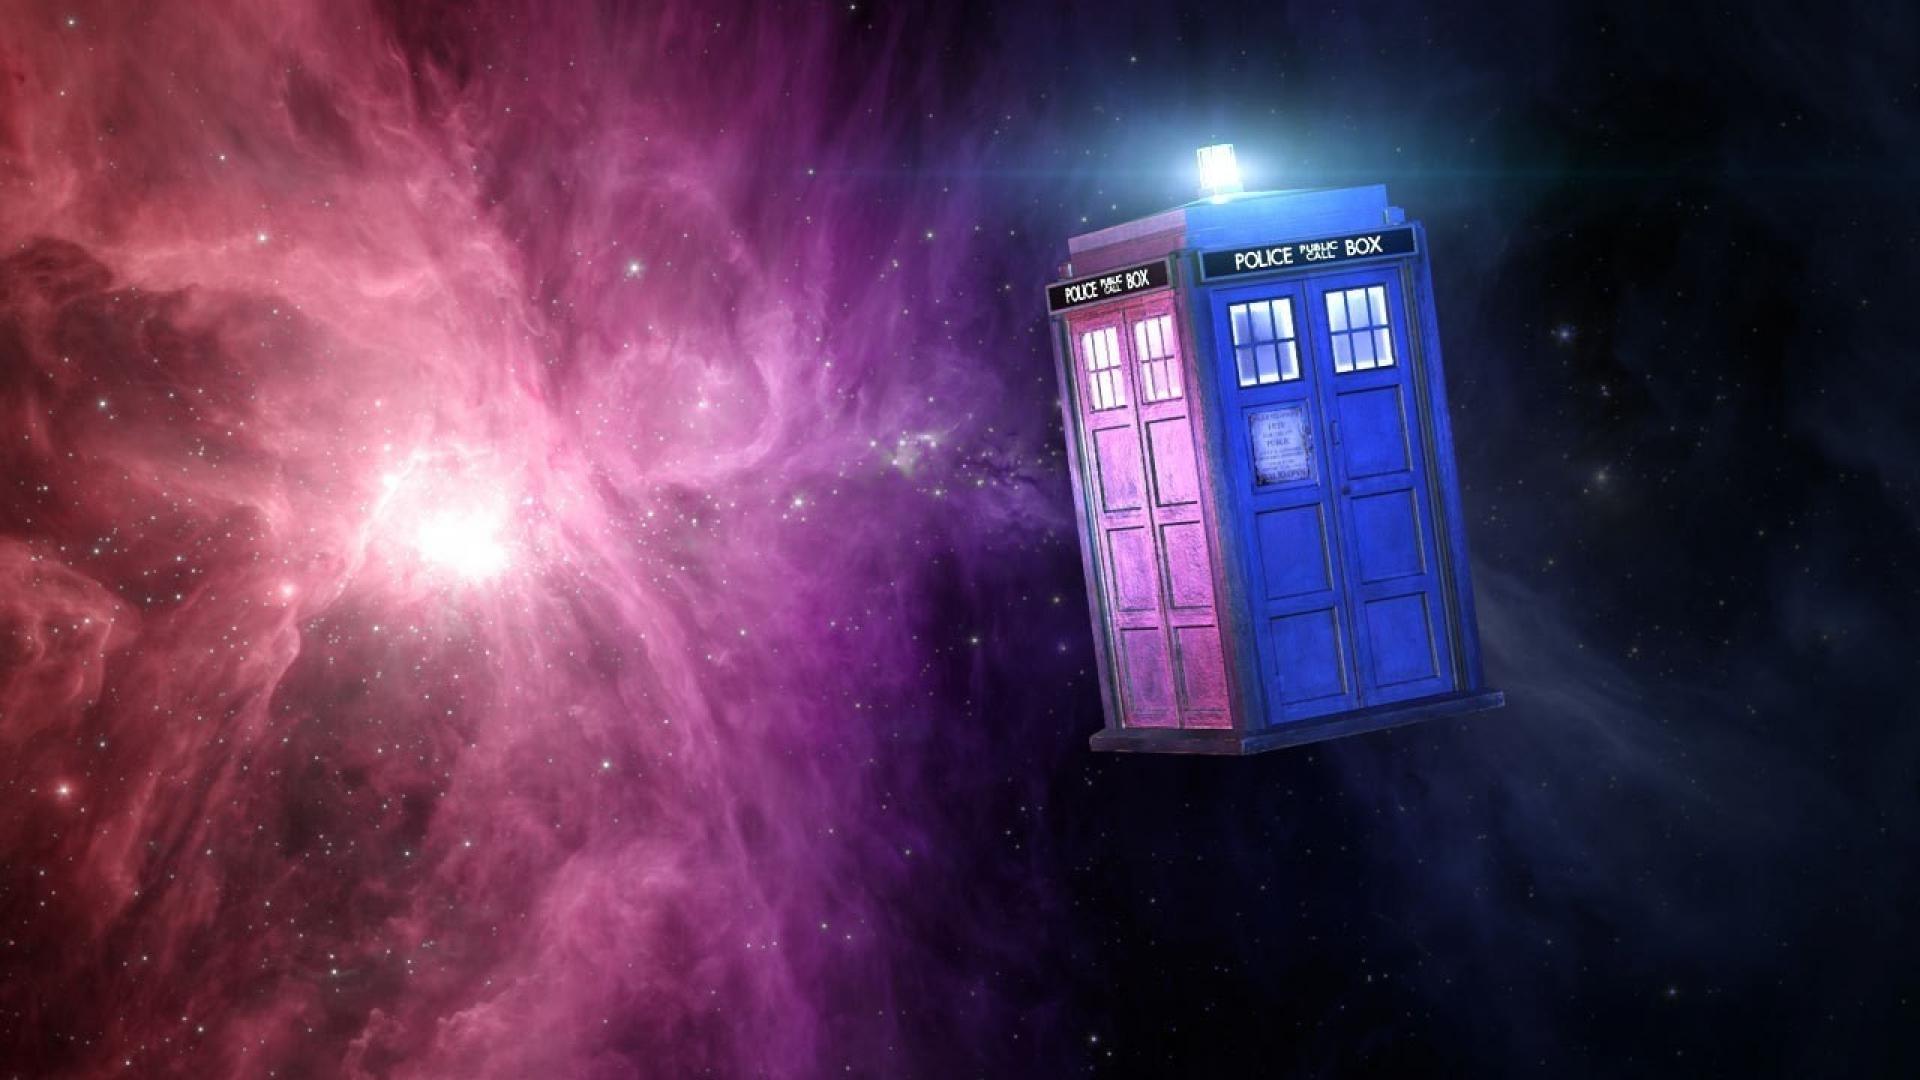 tardis doctor who wallpaper | (11039)